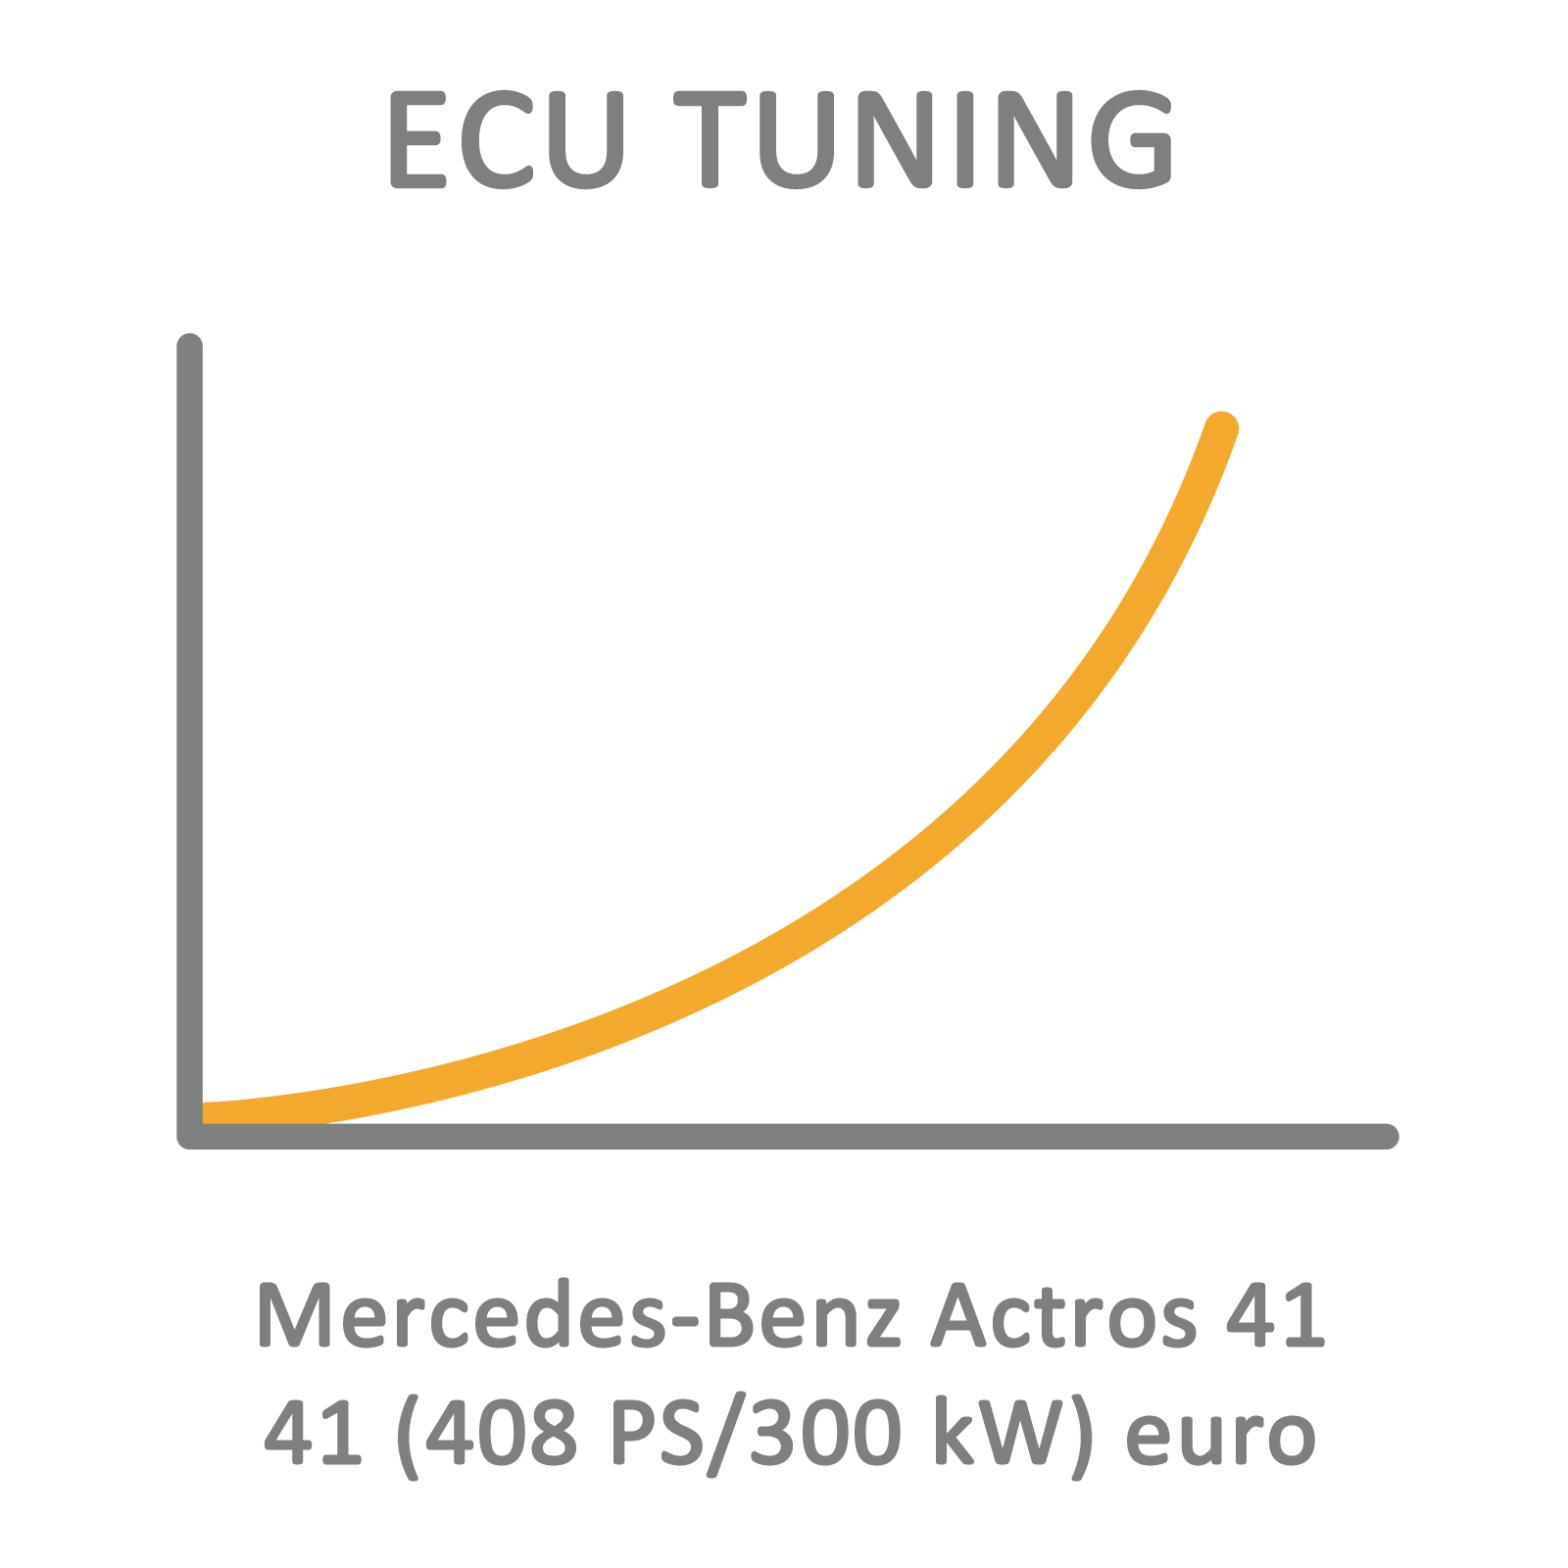 Mercedes-Benz Actros 41 41 (408 PS/300 kW) euro 3+4+5 ECU